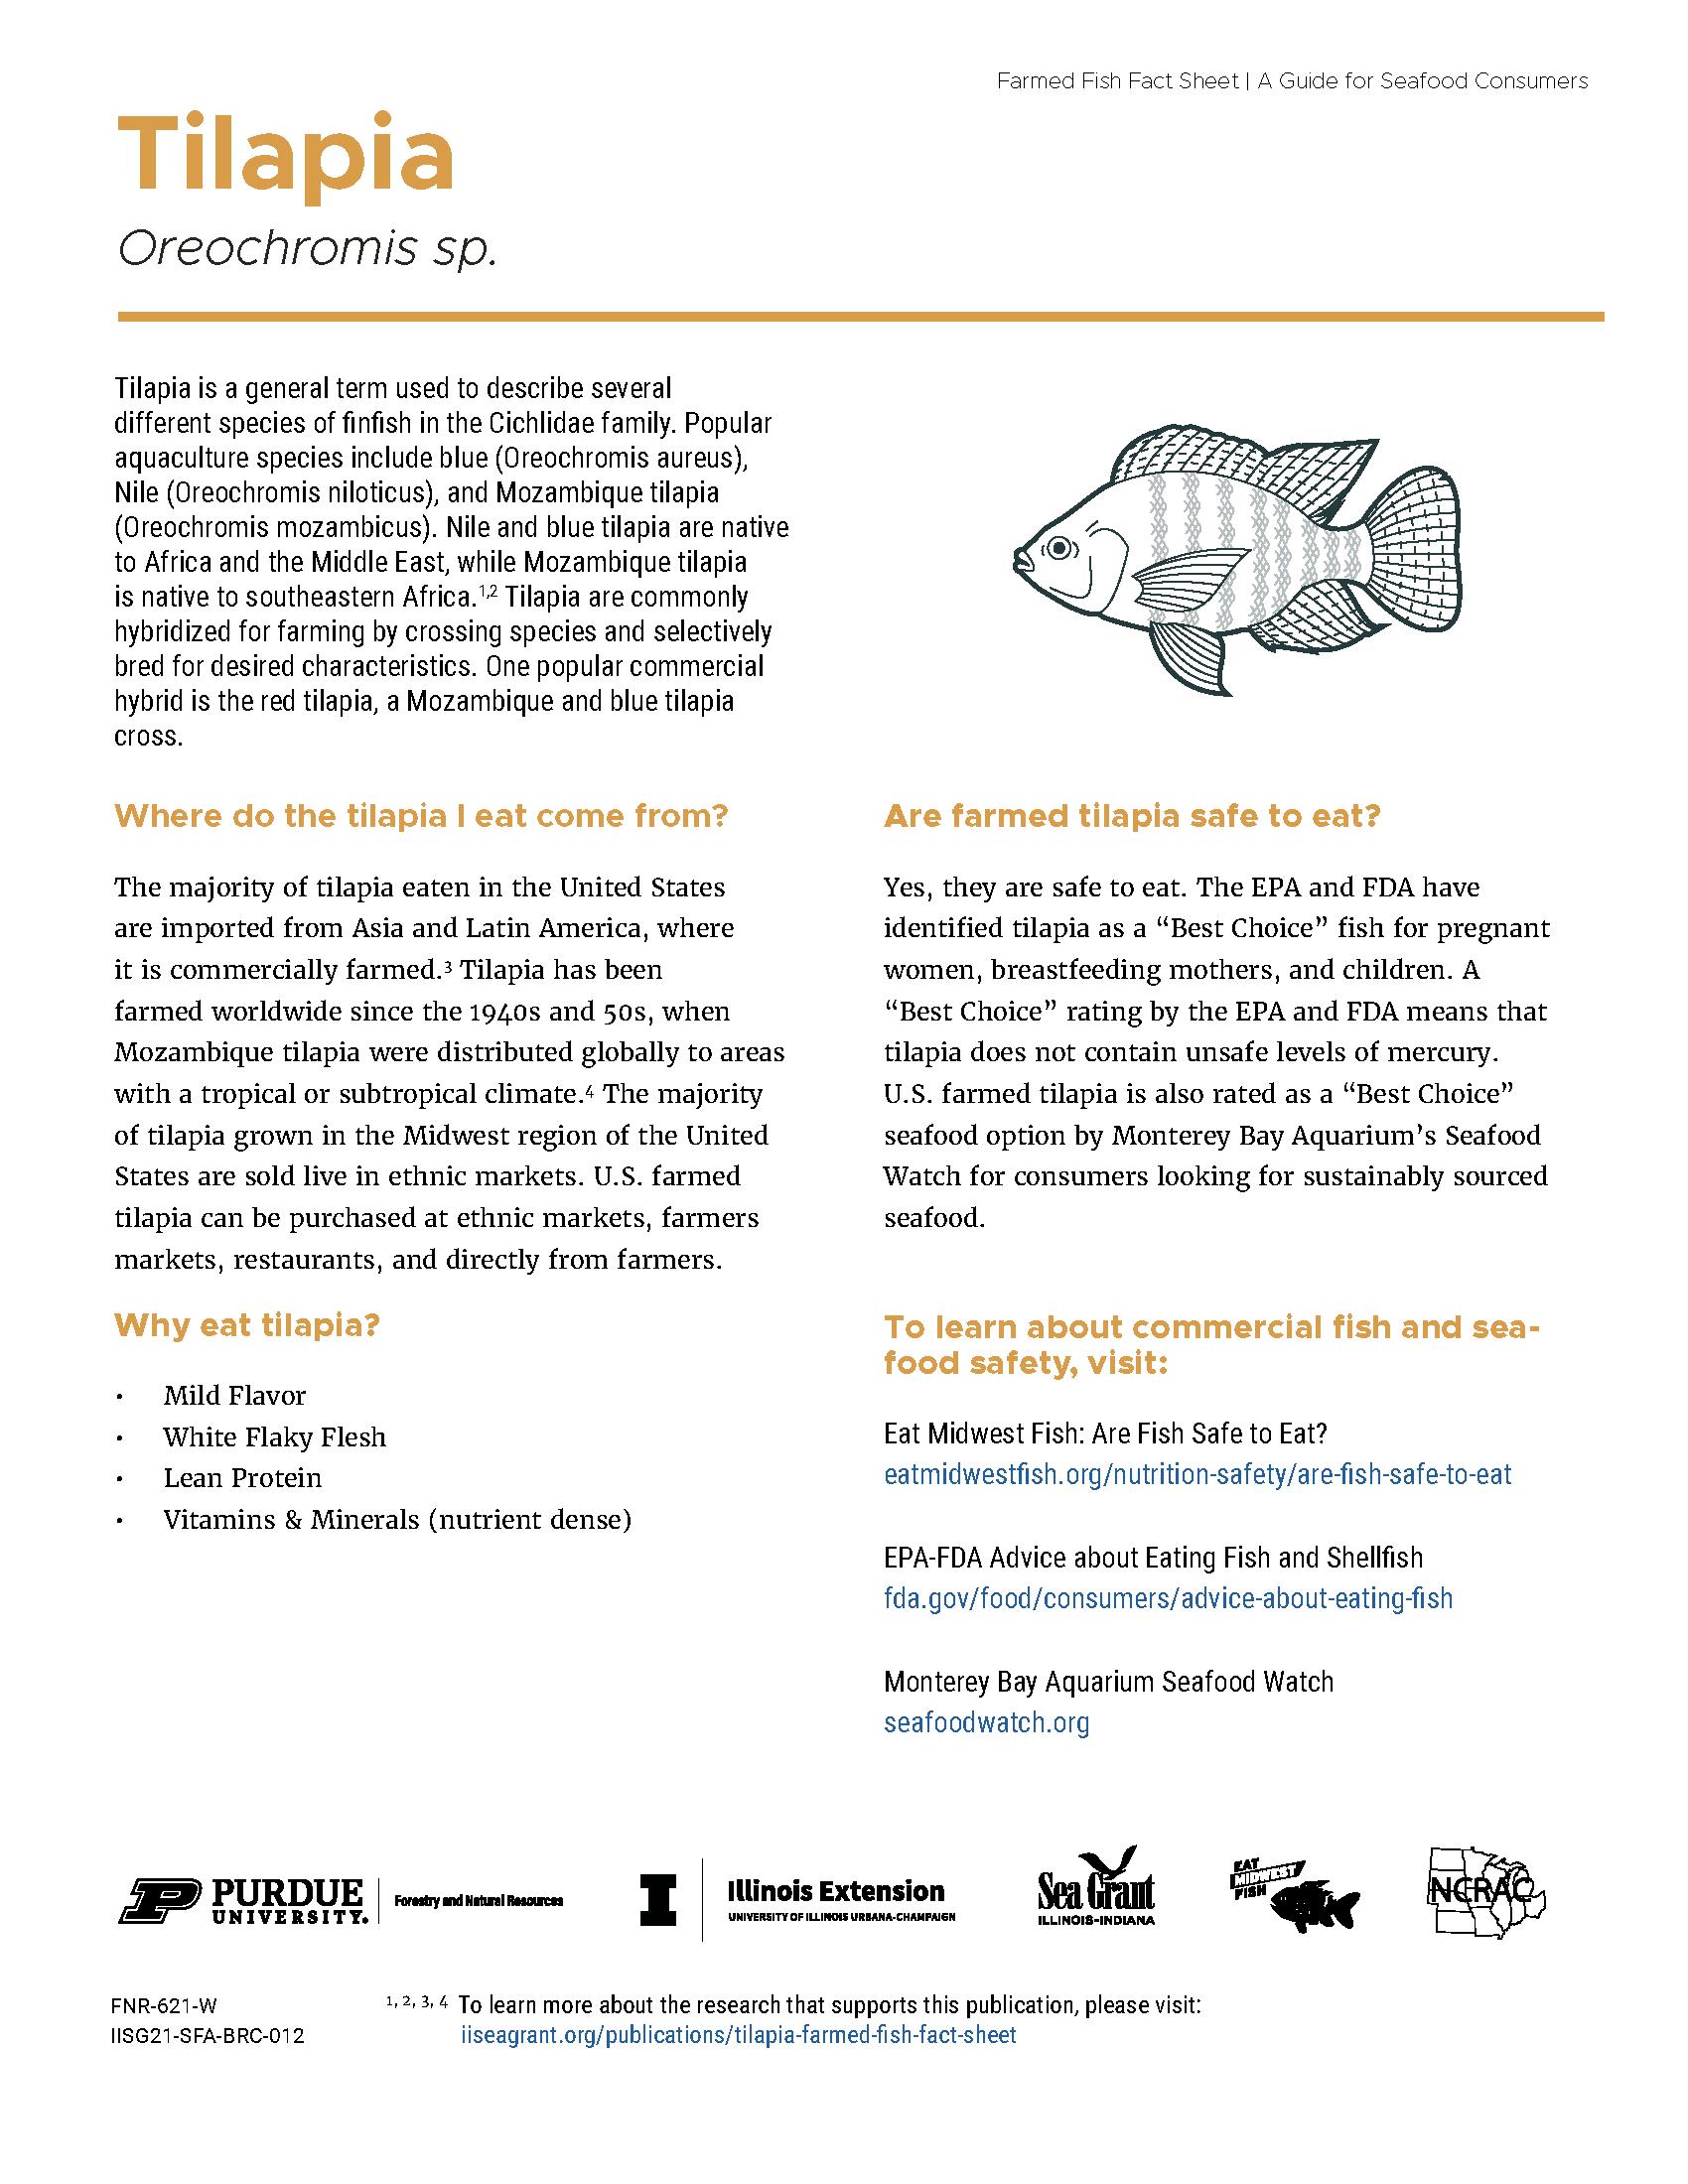 Tilapia Farmed Fish Fact Sheet Thumbnail